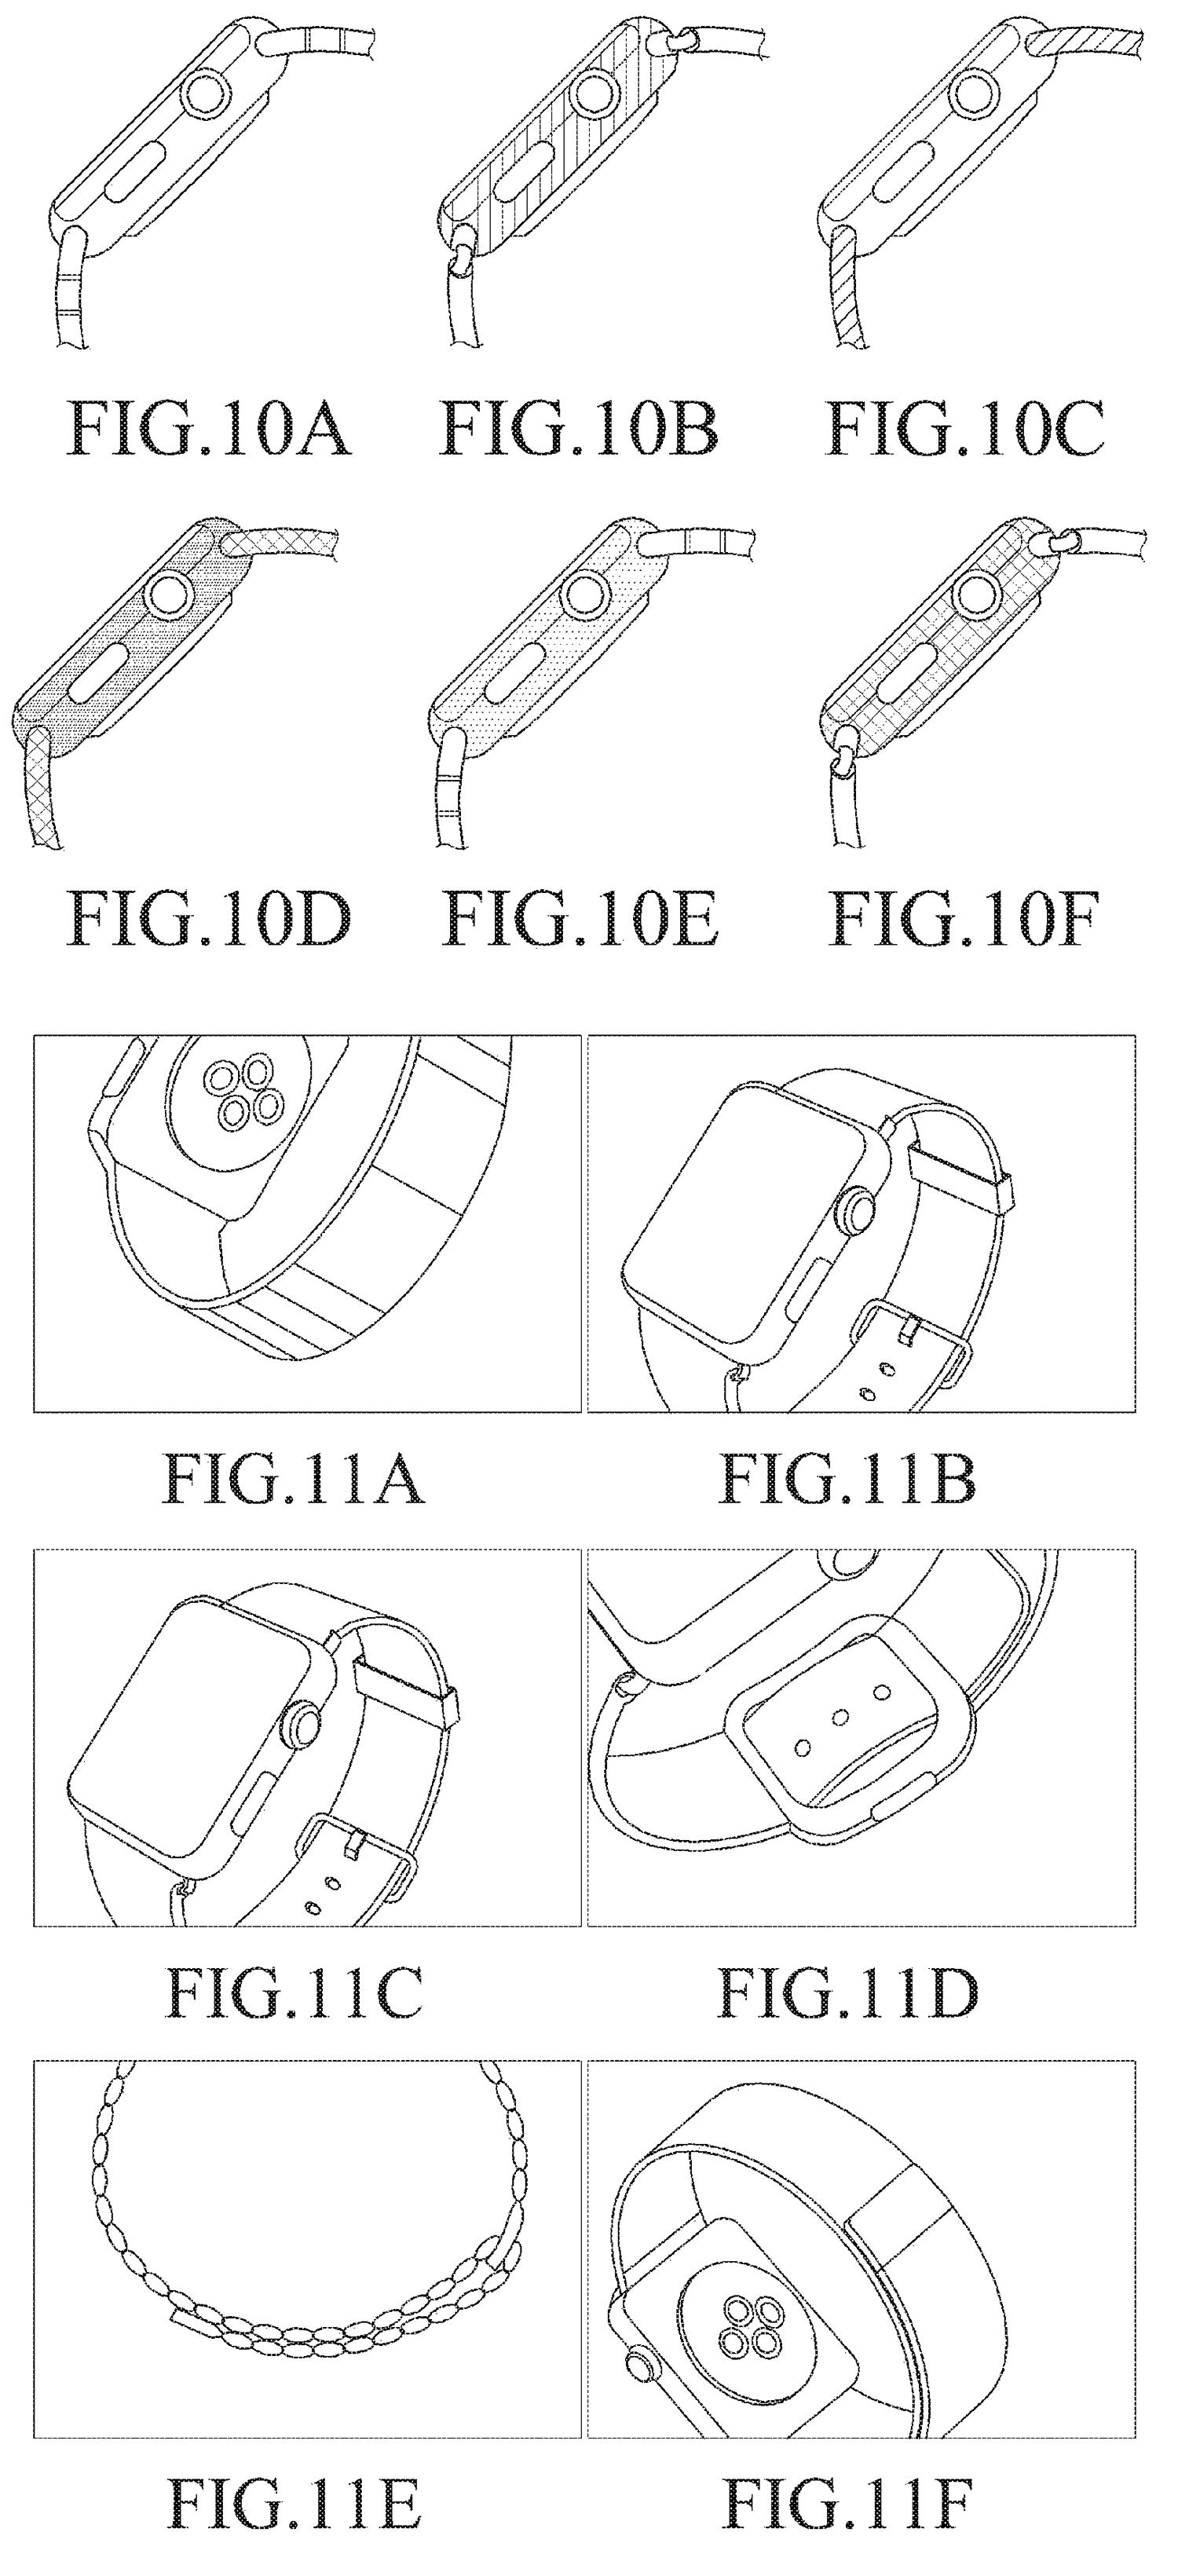 PatentSamsung2